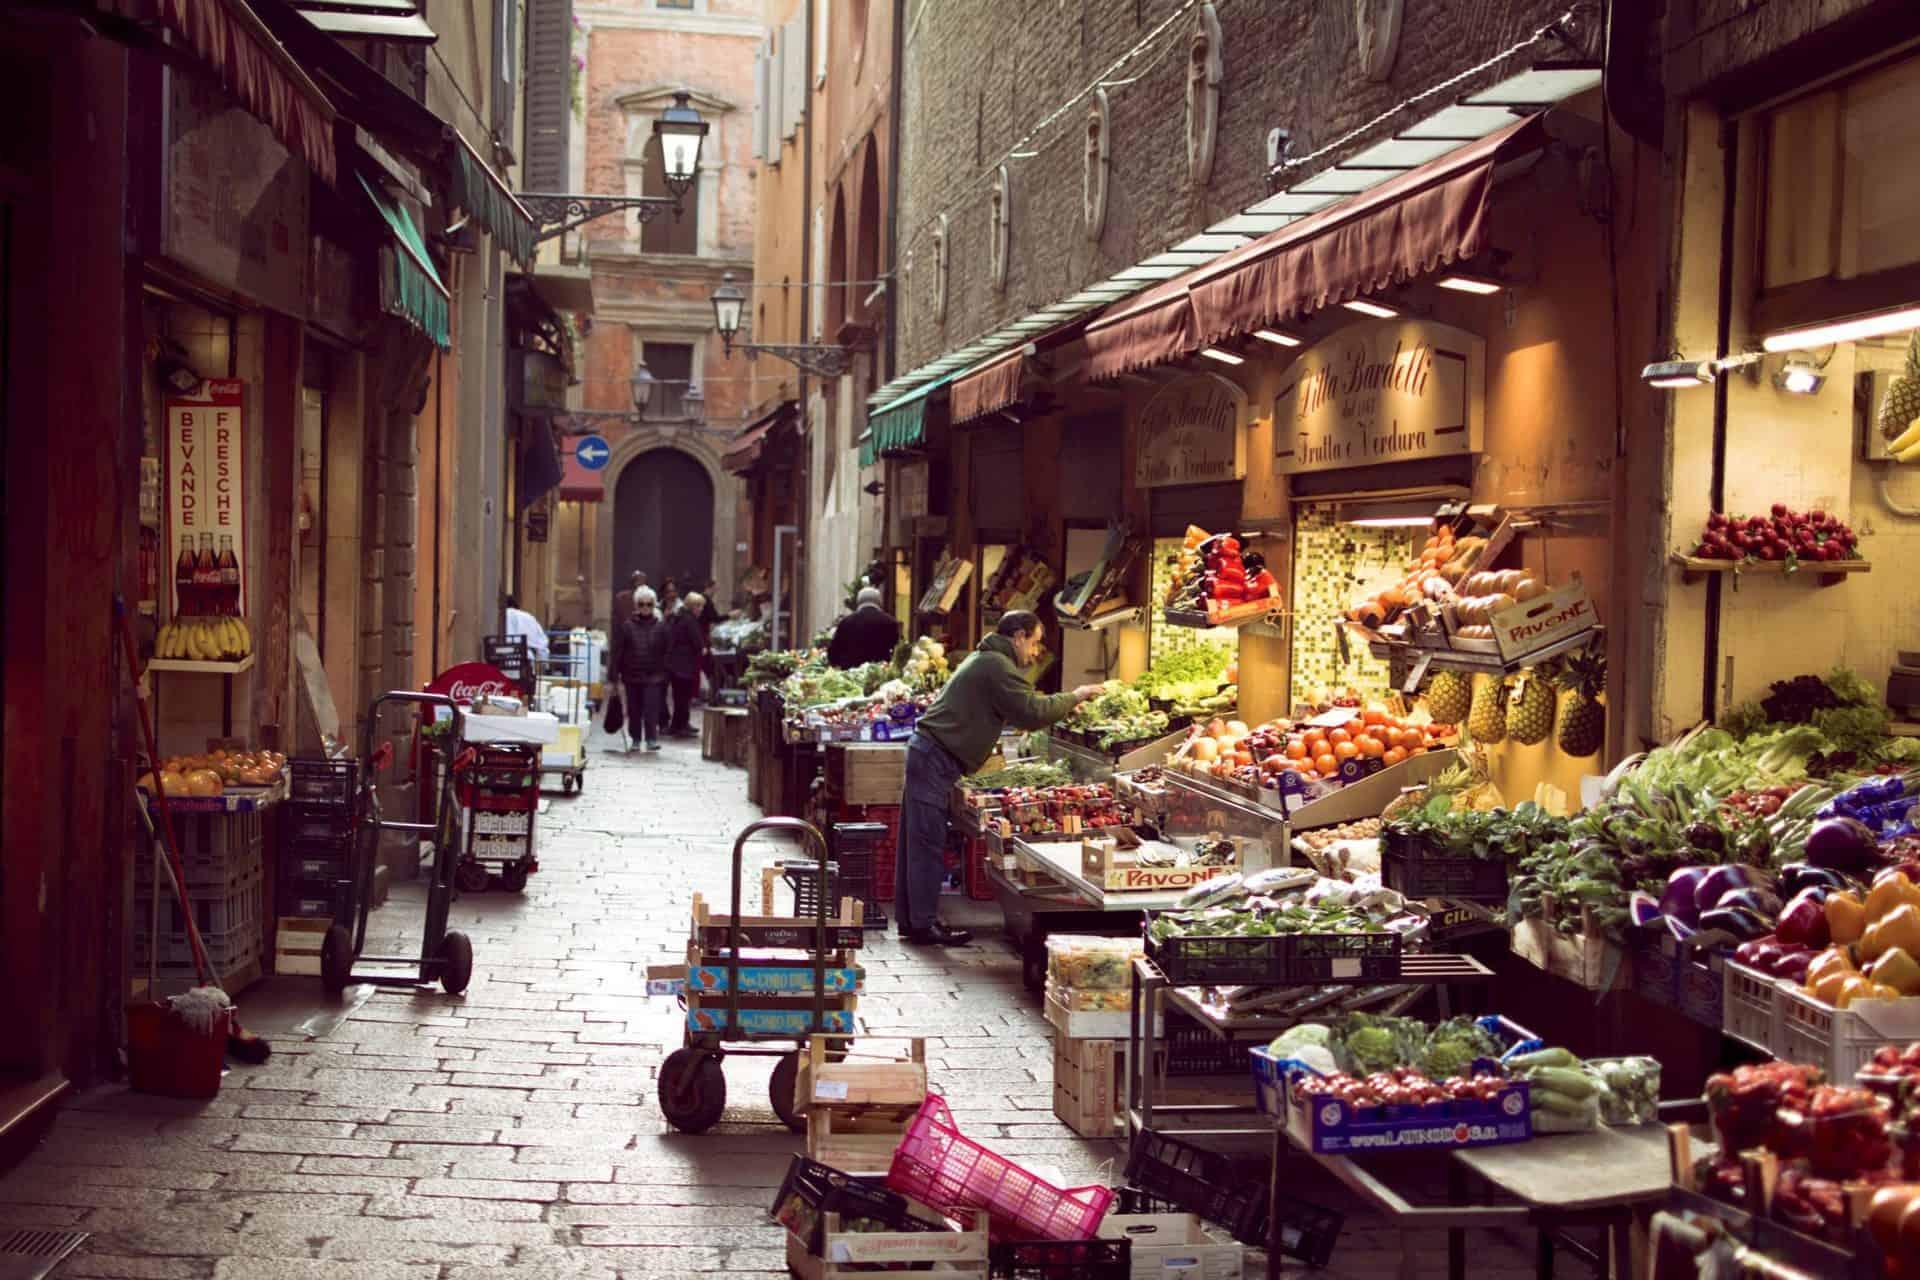 bologna_essential7) Via Pescherie Vecchie (wikimediacommons)